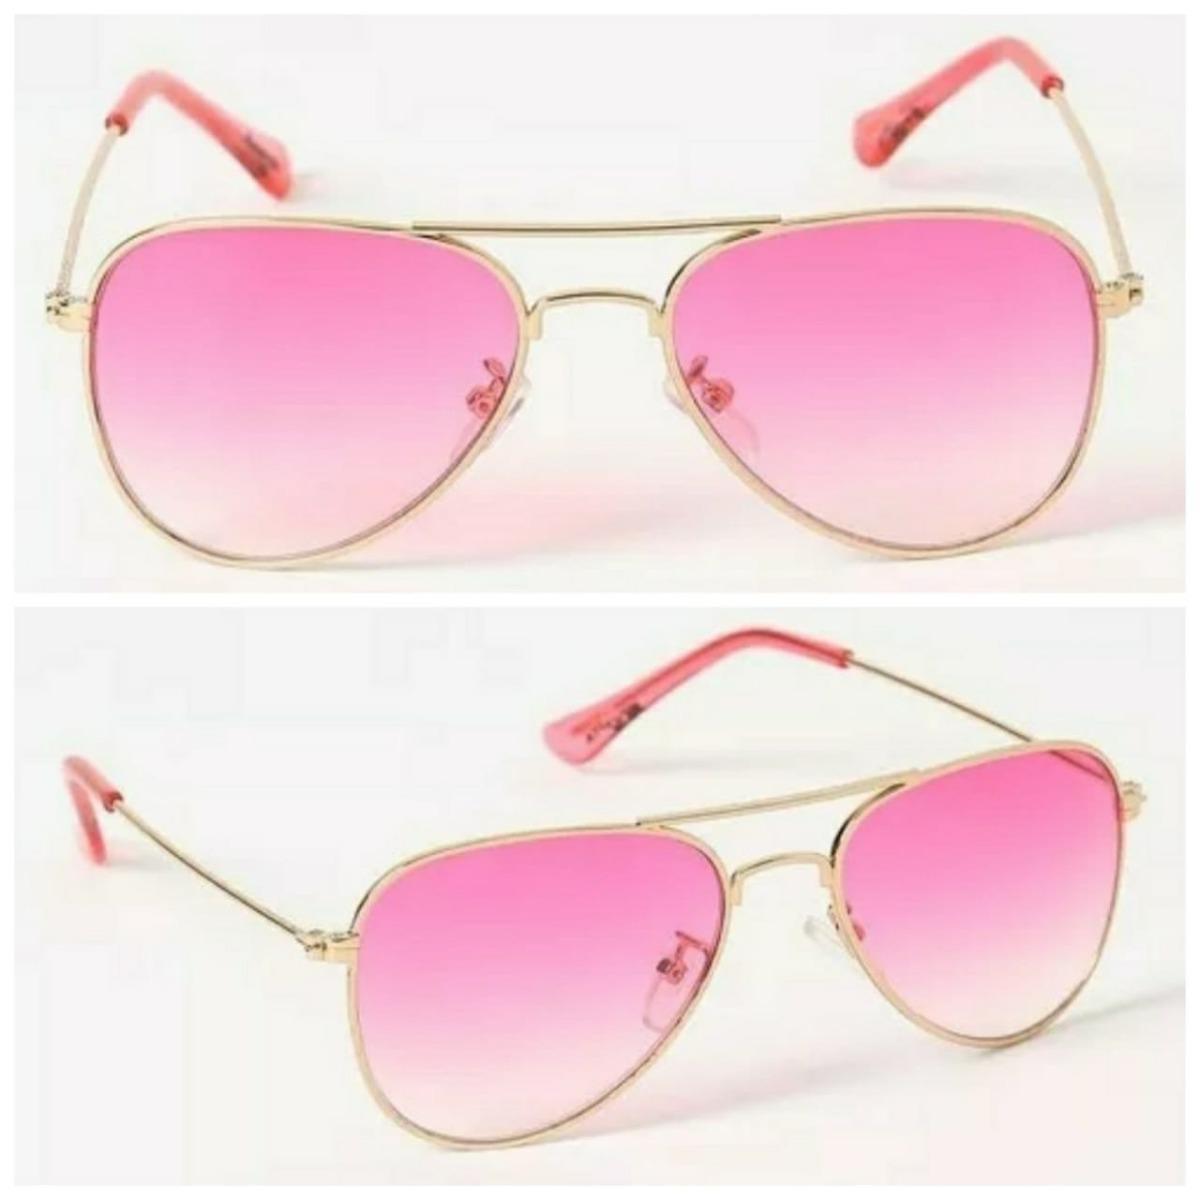 f957a56fa7978 óculos de praia clássico aviador infantil menina bebe barato. Carregando  zoom.